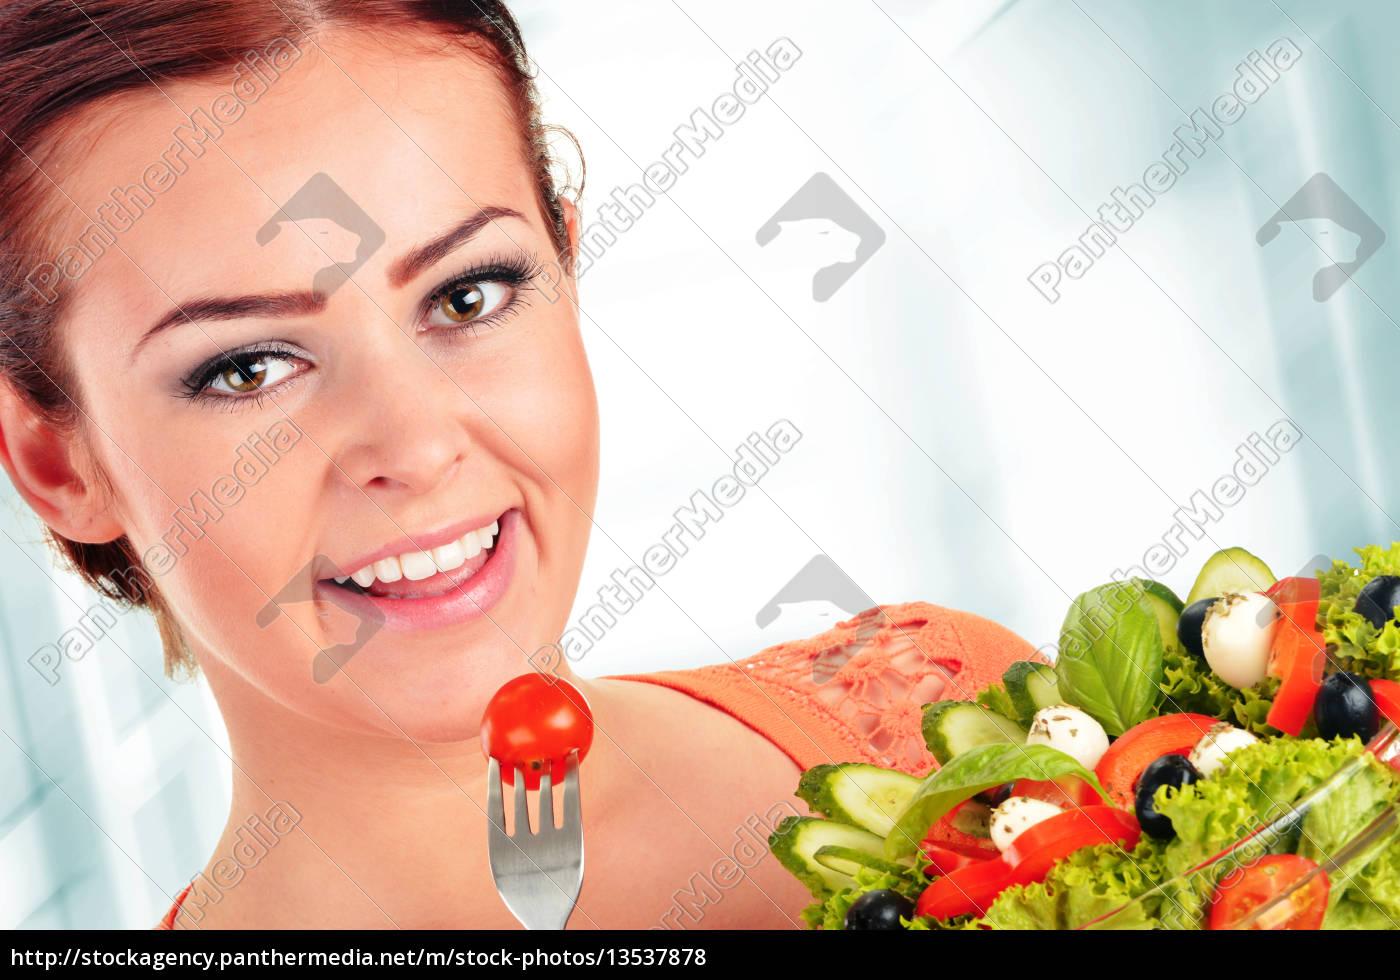 young, woman, eating, vegetable, salad - 13537878